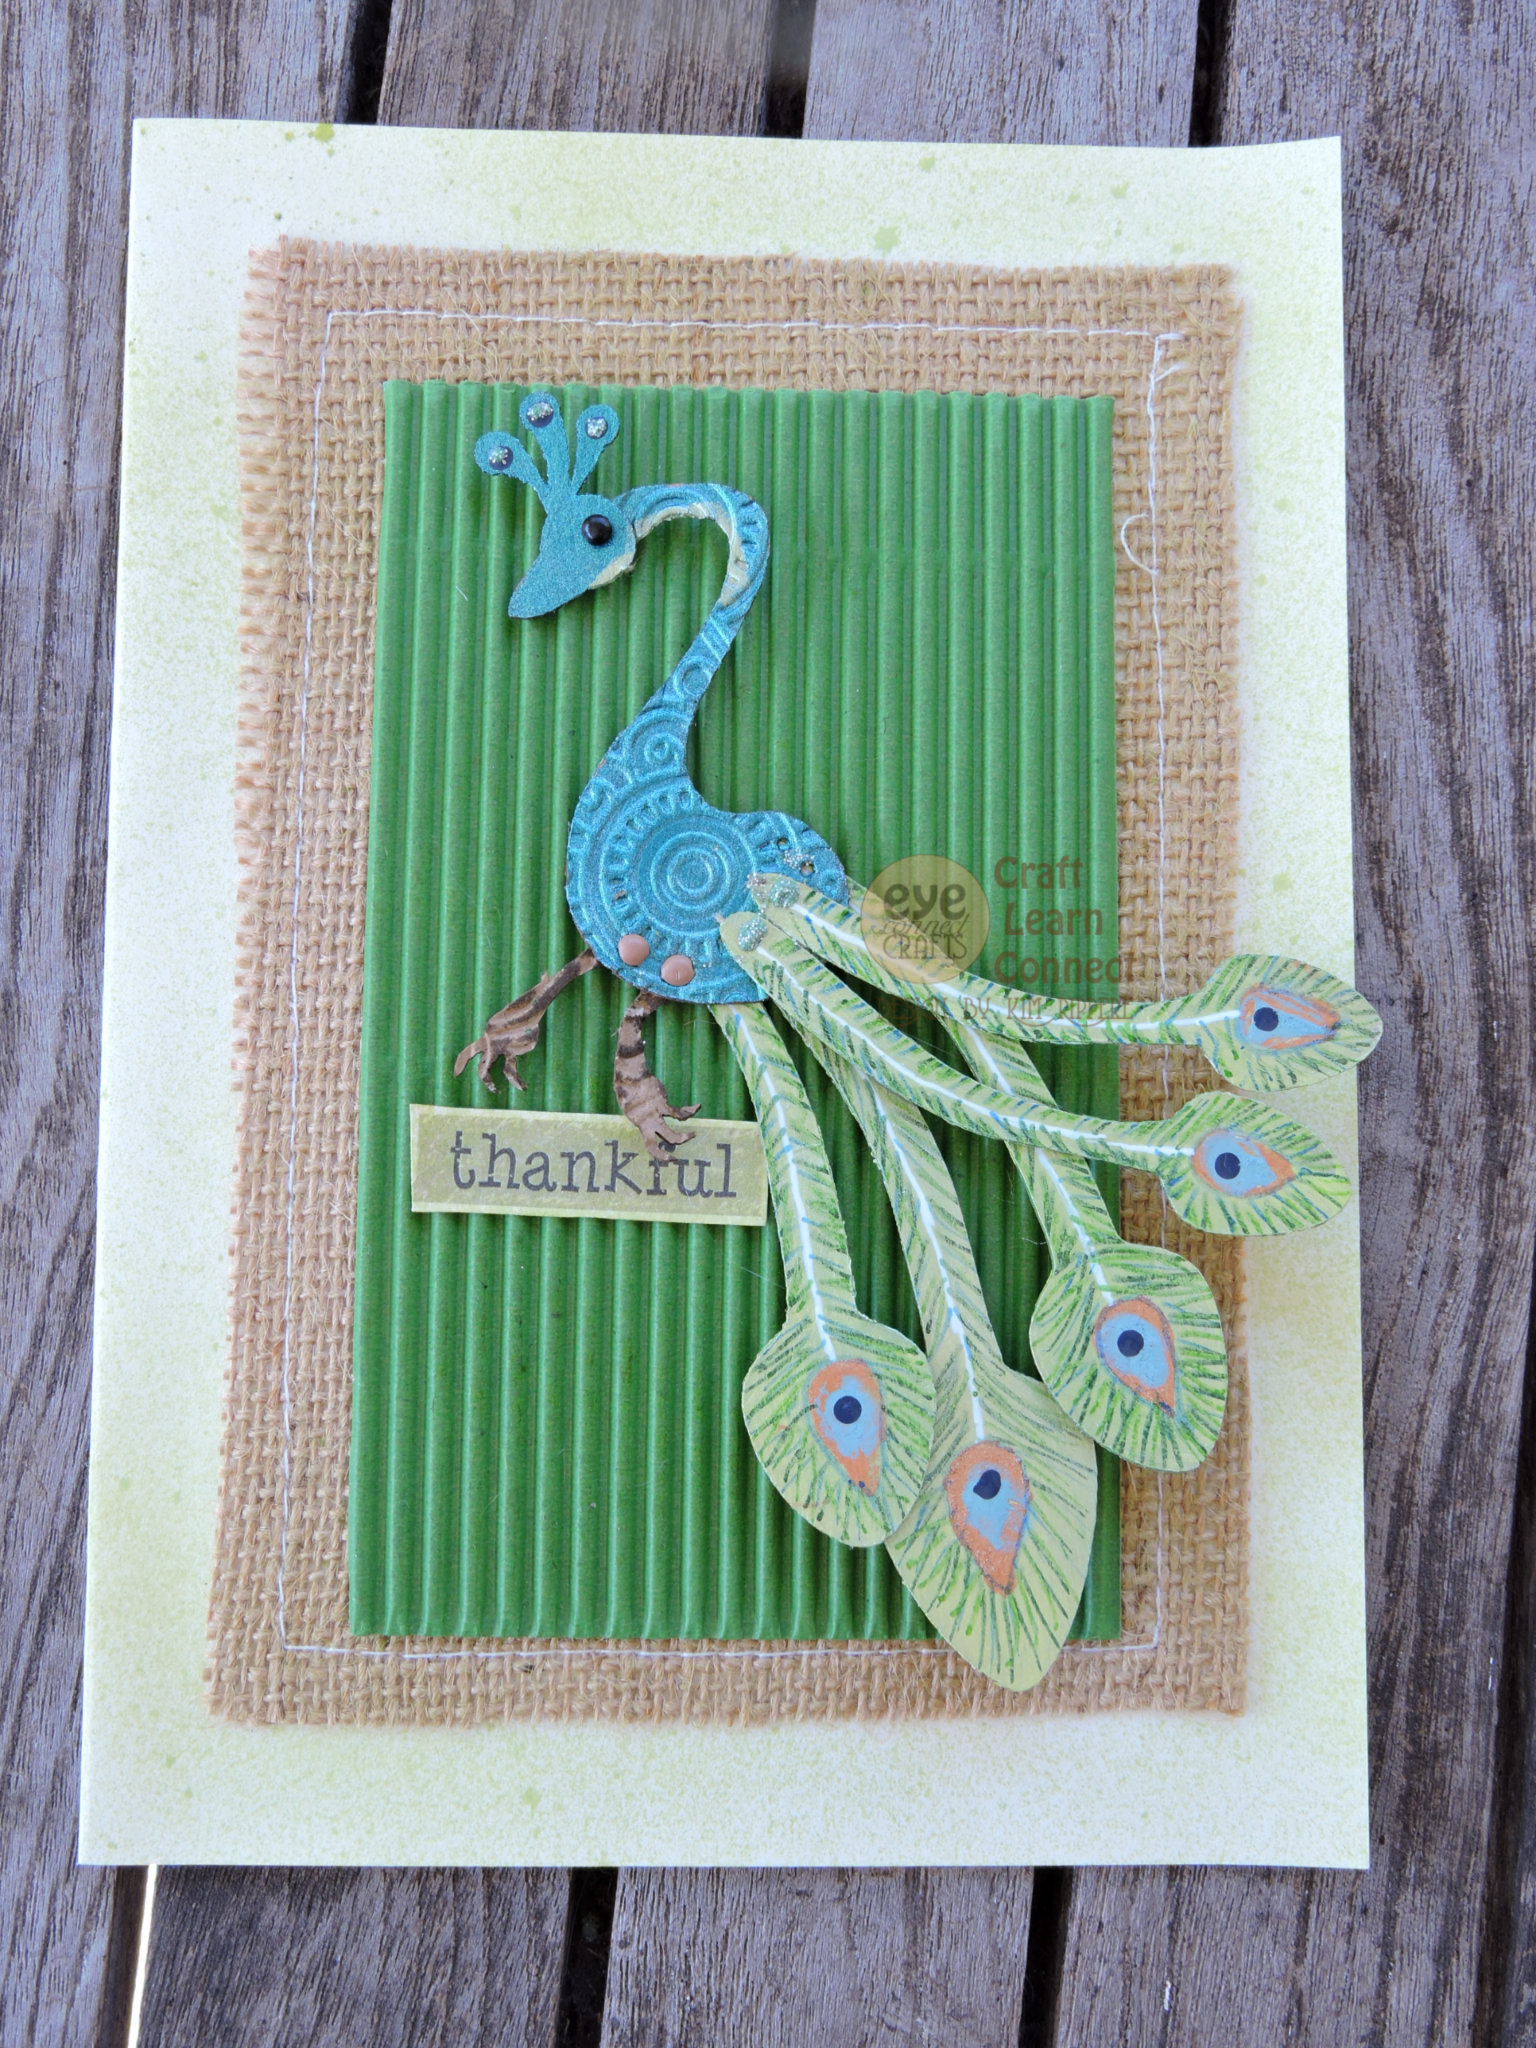 The Final Blue Peacock Card